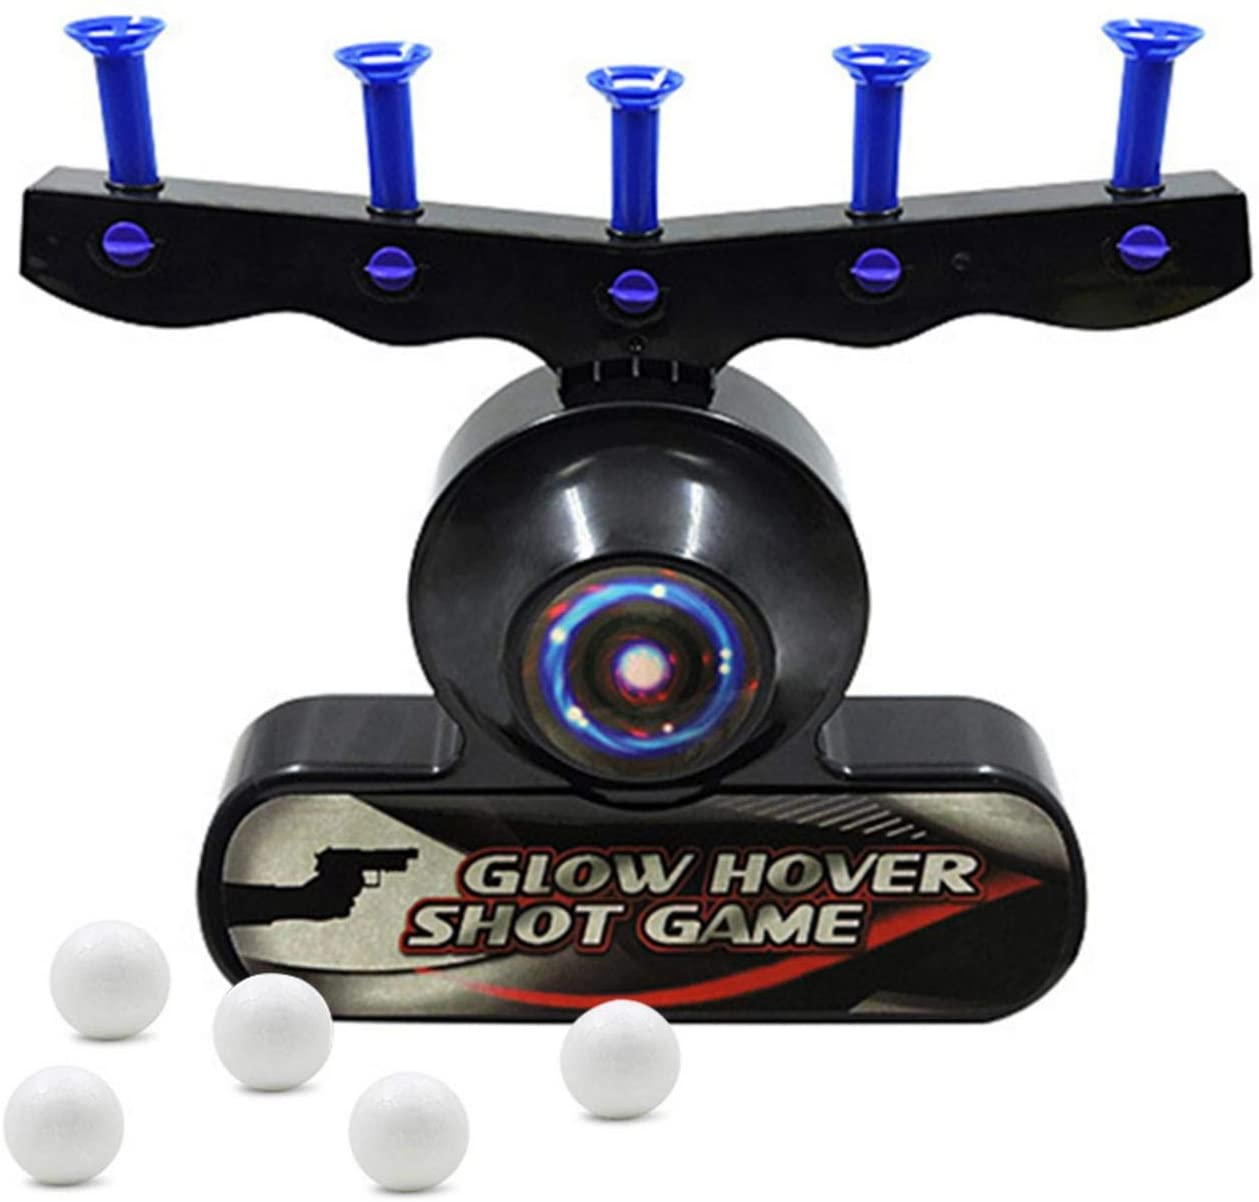 wuxiaobo Electric Floating Flying Ball Target Boy Toy Gun Dart Target Shooting Target Toy Floating Ball Electronic Shooting Game Safe for Boys Over 14